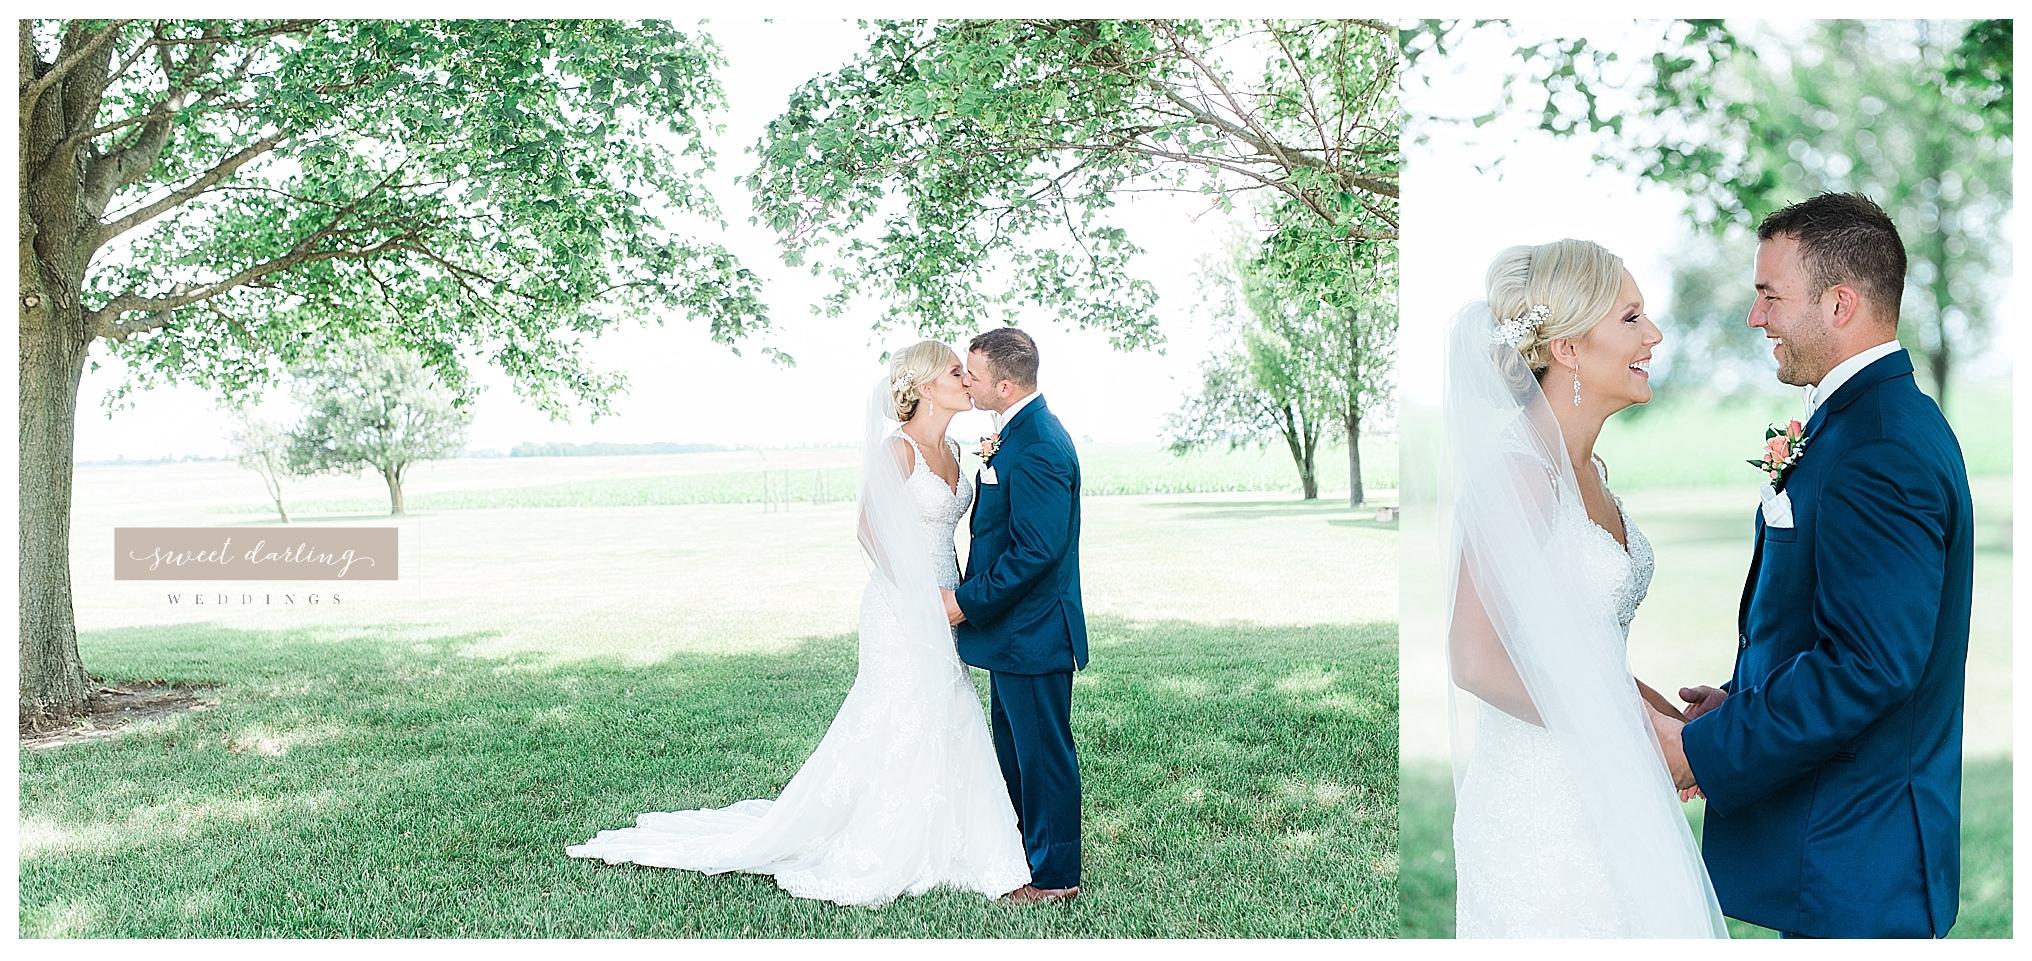 Paxton-illinois-engelbrecht-farmstead-romantic-wedding-photographer-sweet-darling-weddings_1216.jpg